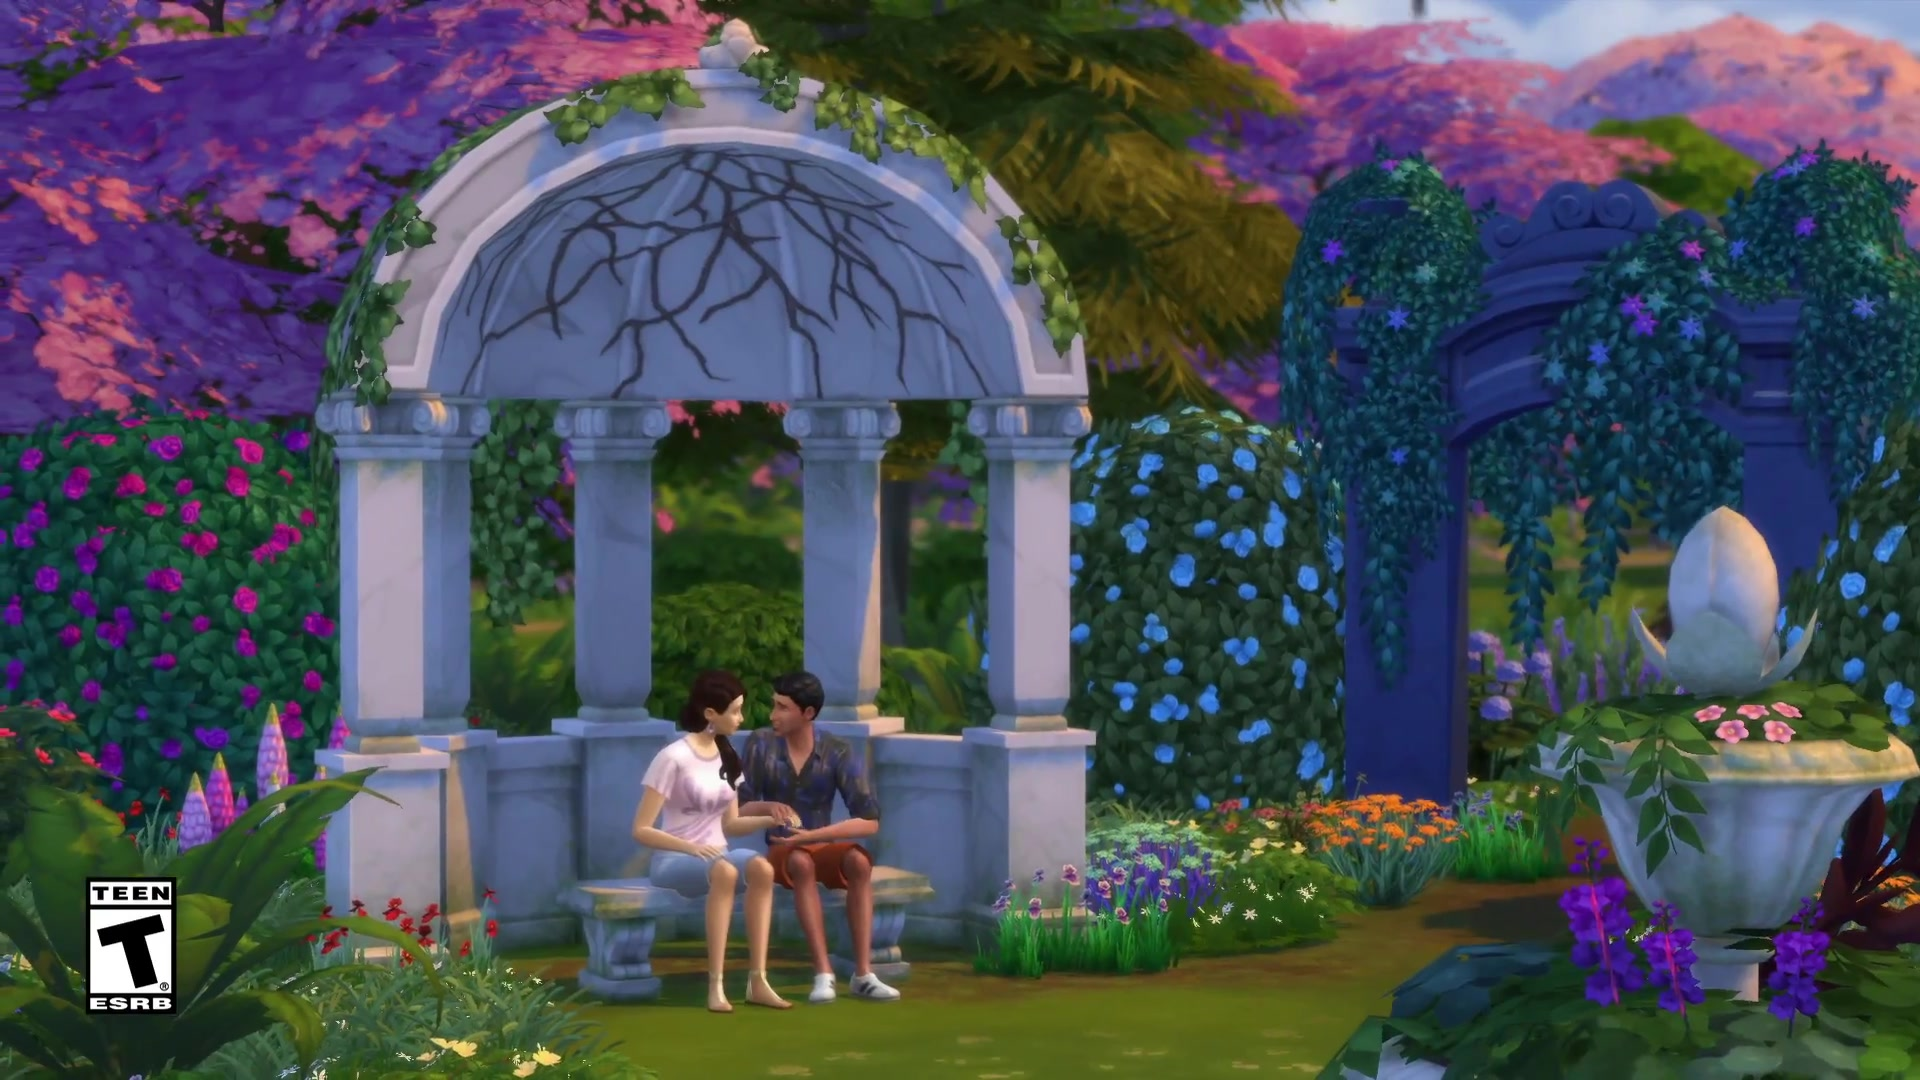 The-sims-4-romantic-garden-stuff--official-trailer